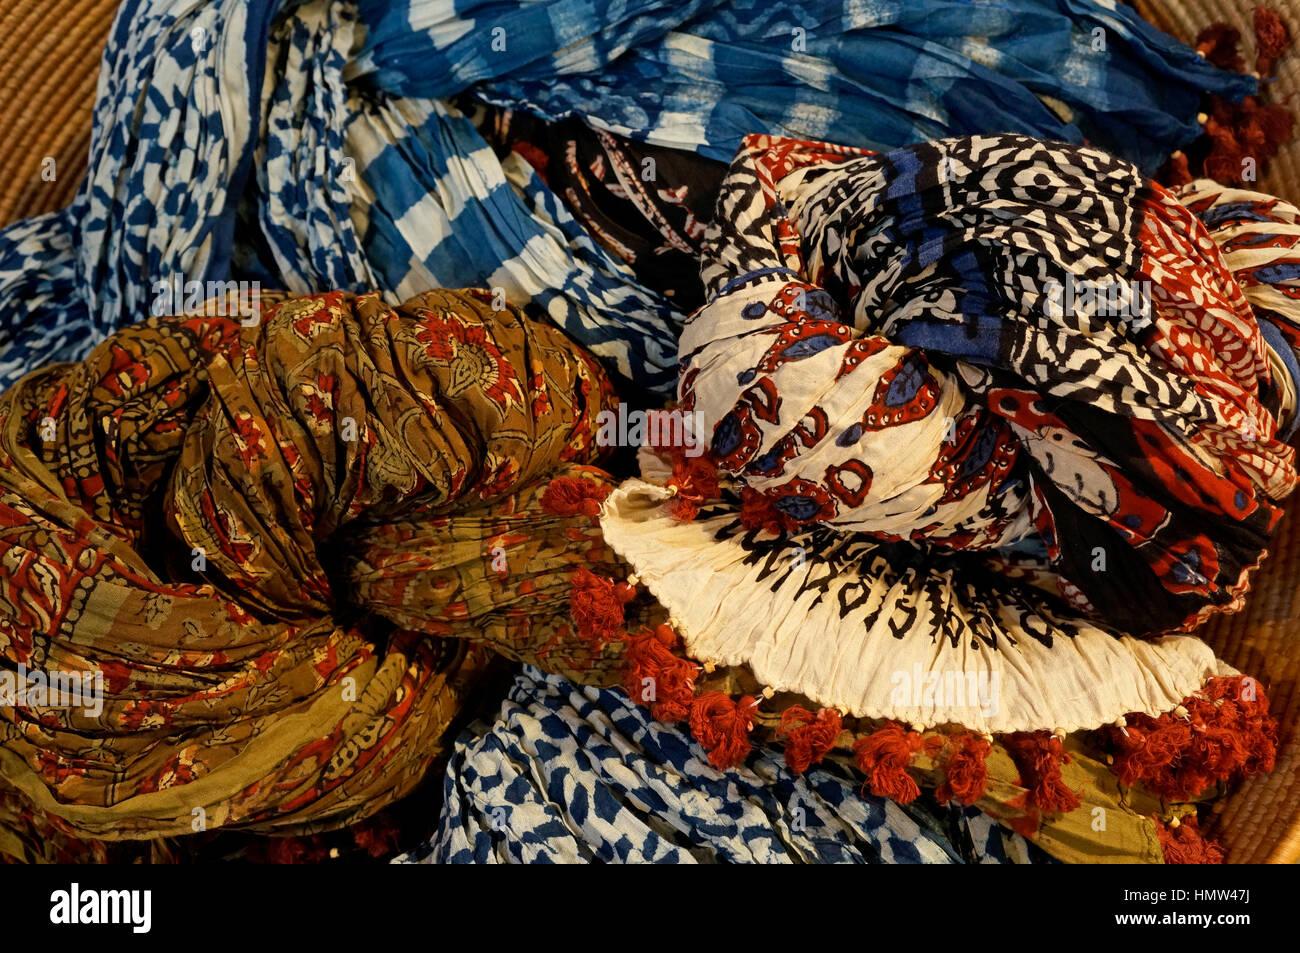 hand-dyed-and-hand-stamped-kalamkari-sty